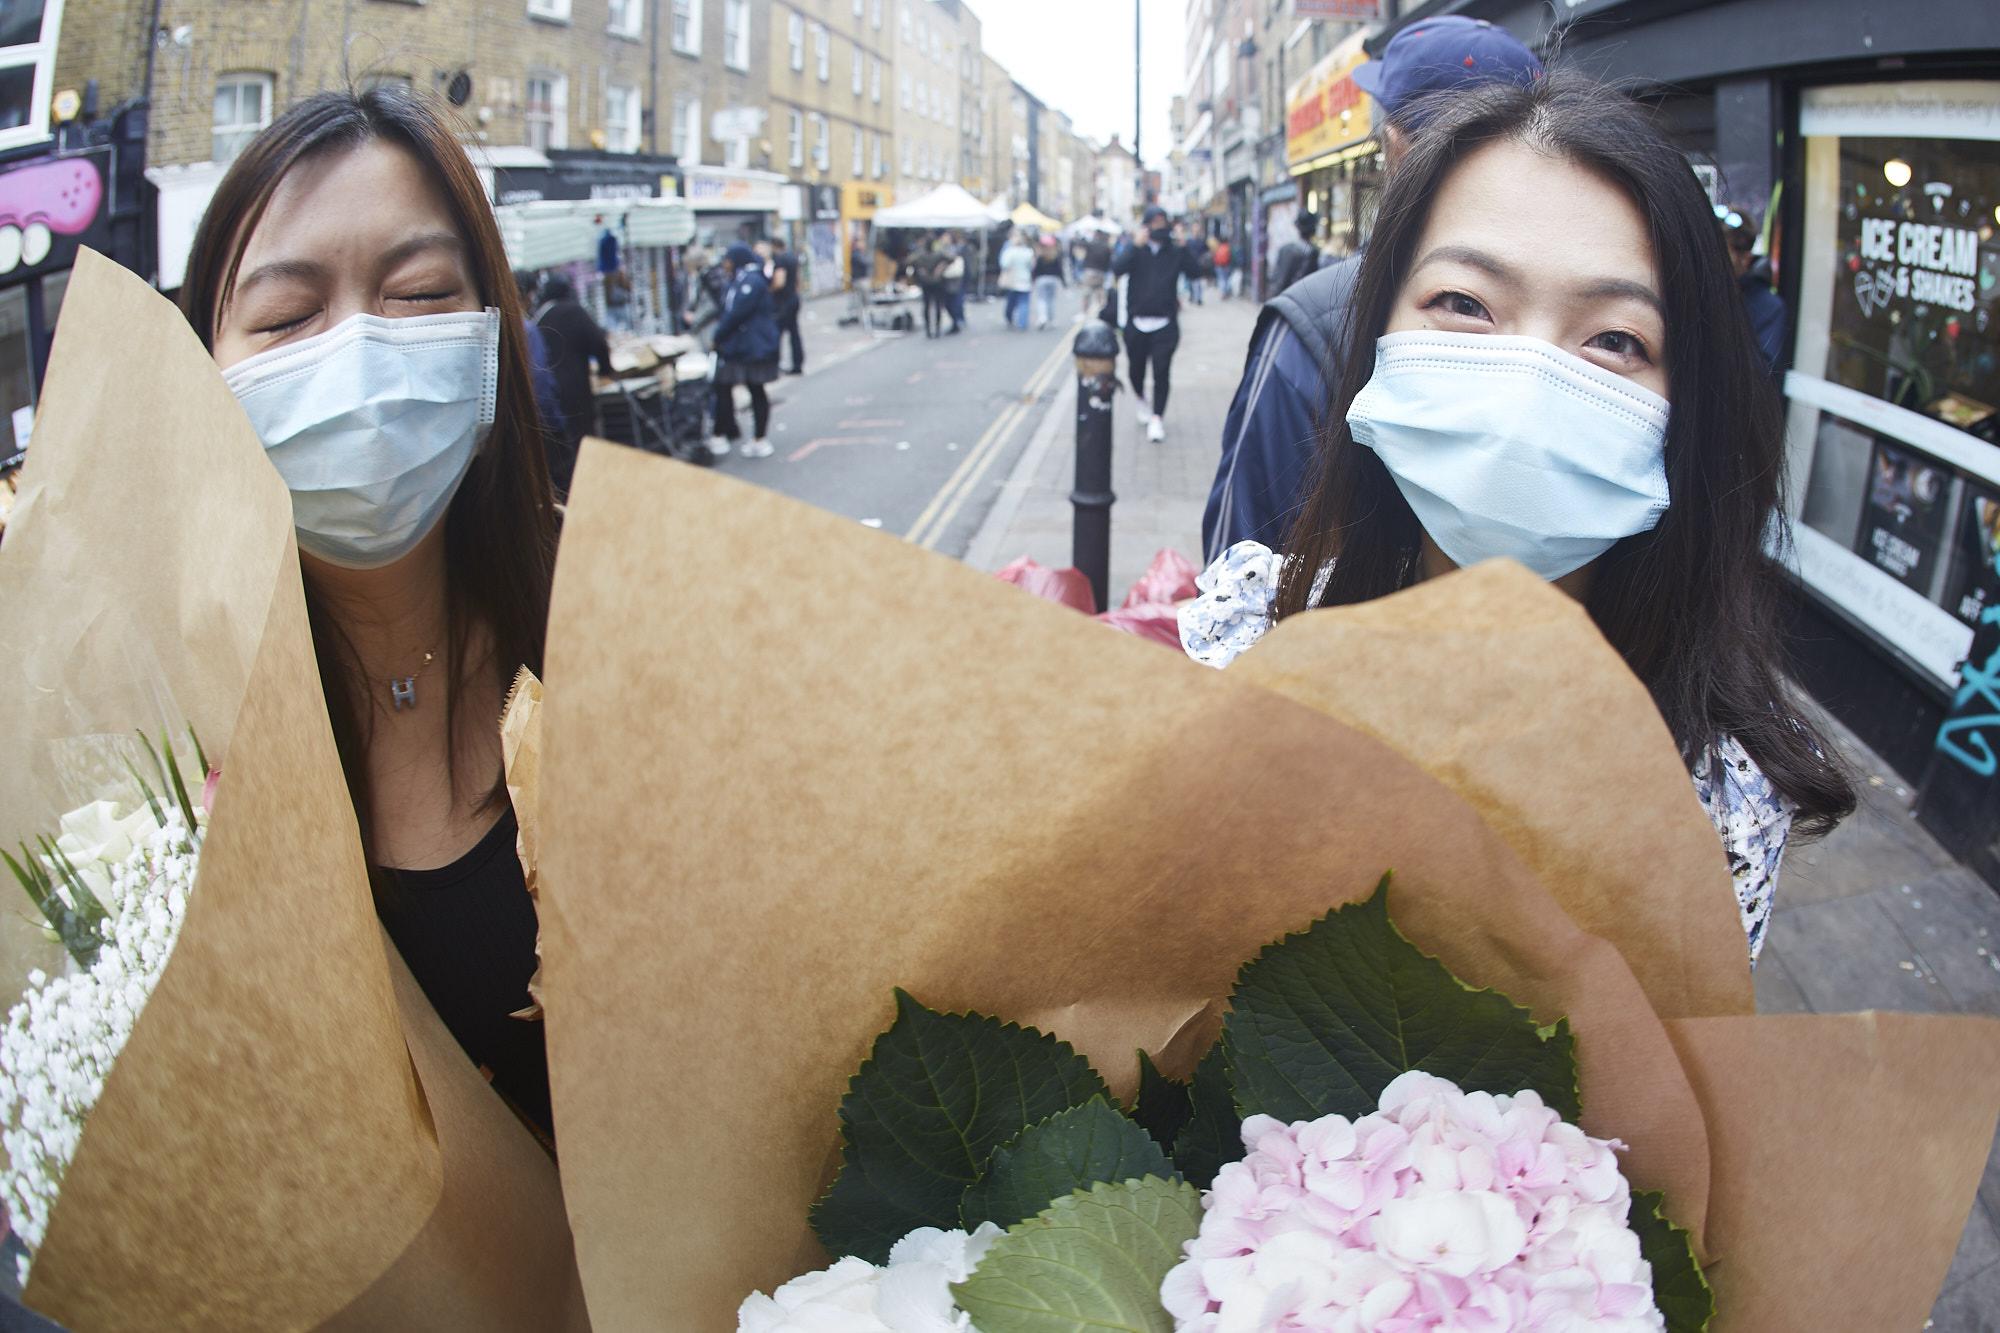 street photography workshop in London